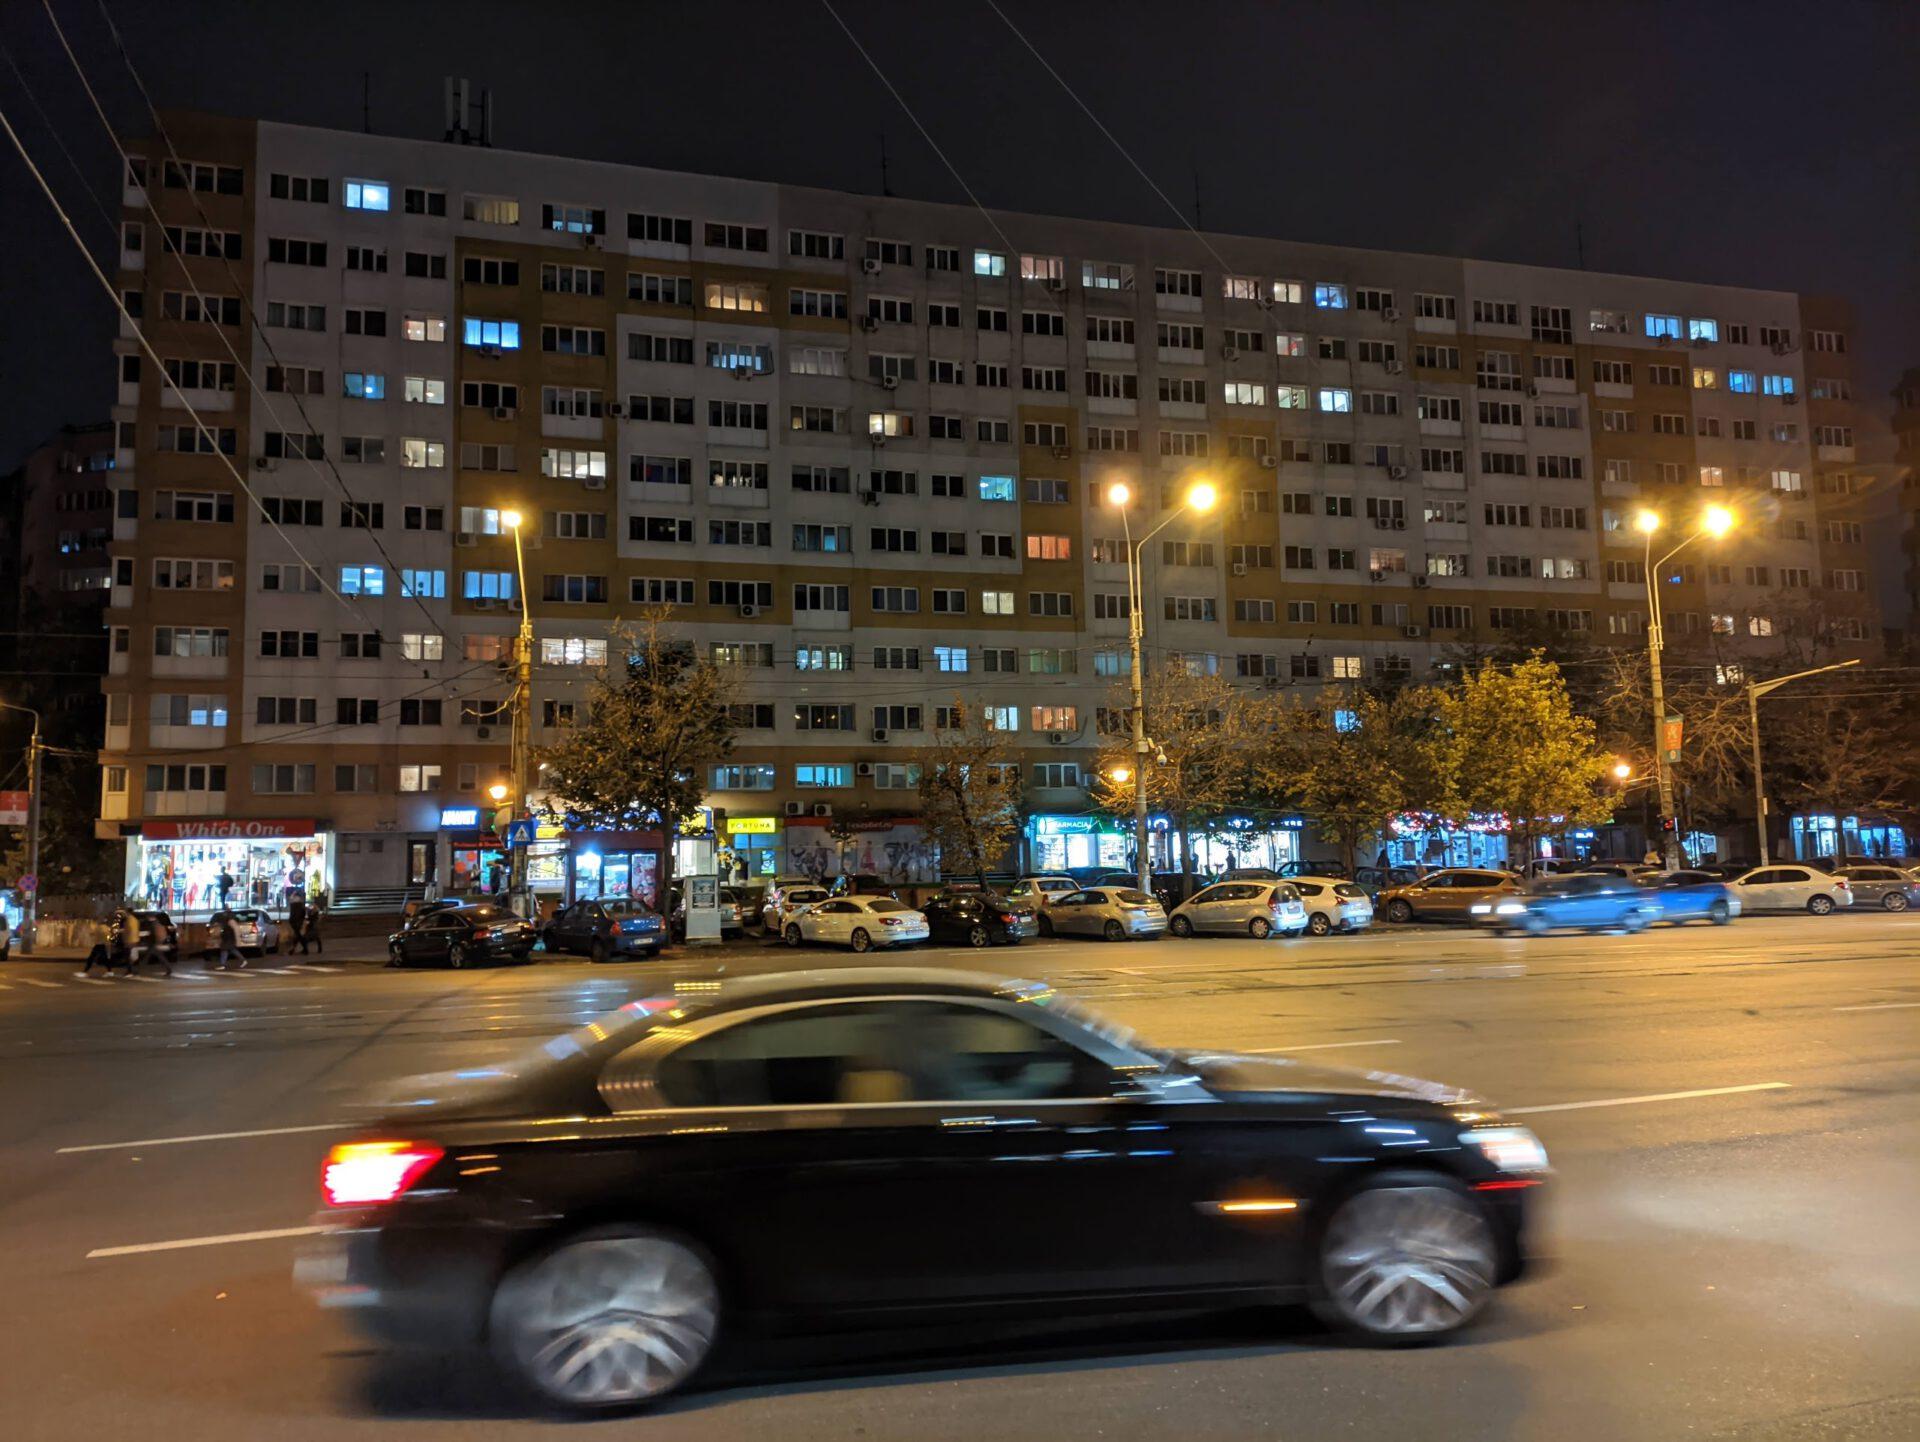 România rămâne cimitirul mașinilor din Europa